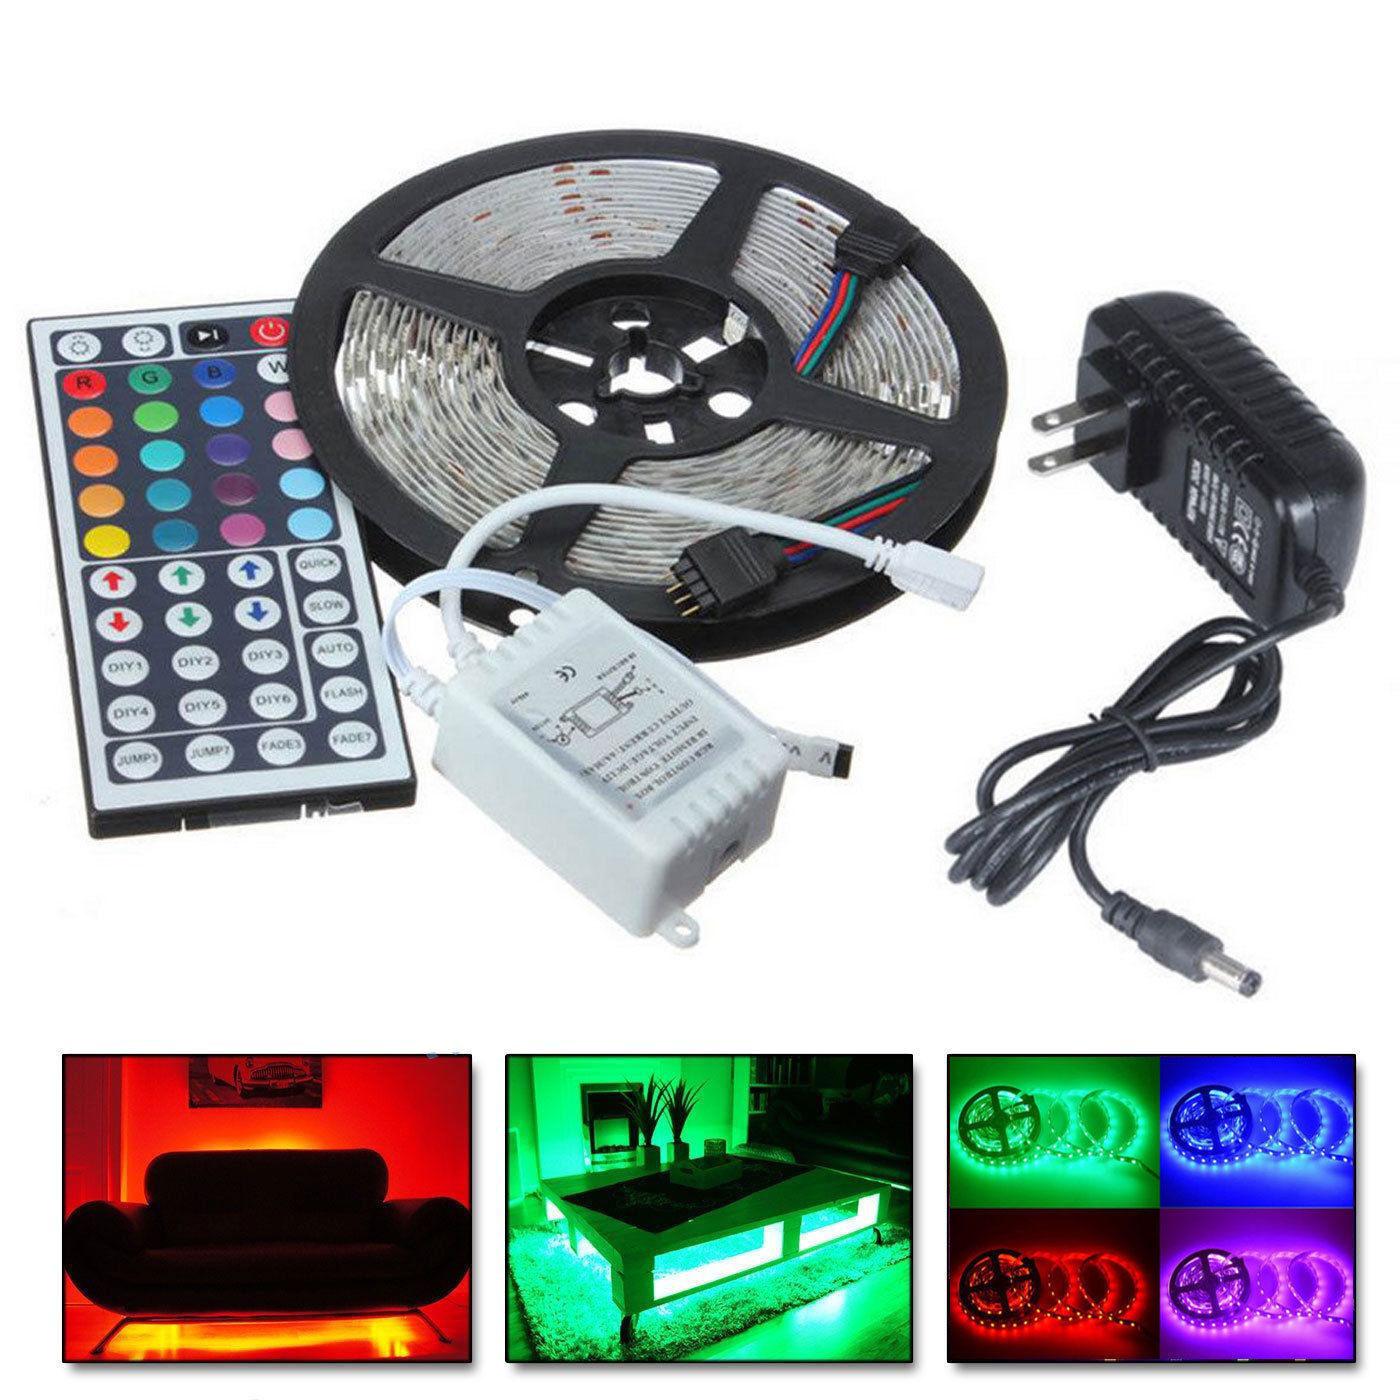 RGB 5050 Waterproof LED Strip light SMD 44 Key Remote 12V Power 5M